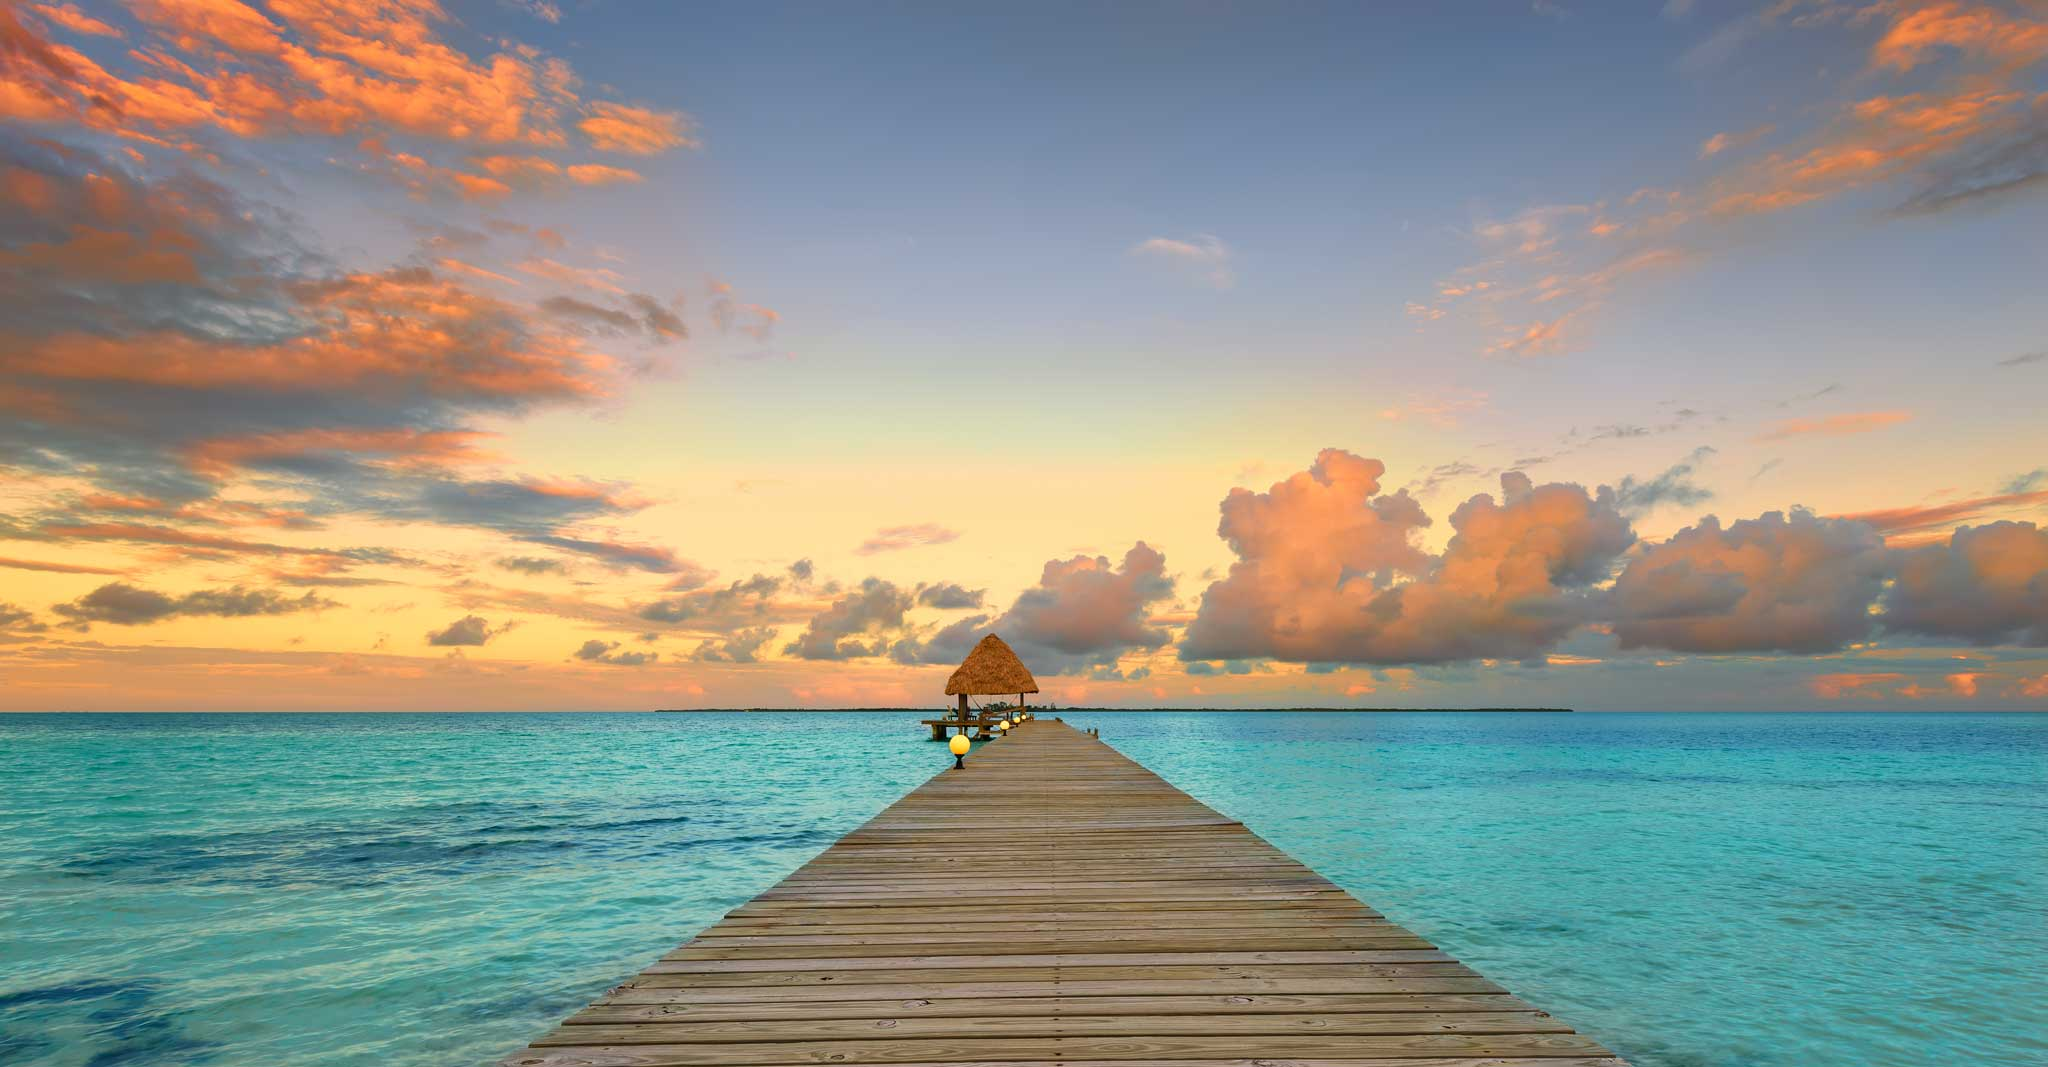 Photo Sunset In Belize Coco Plum Island Resort